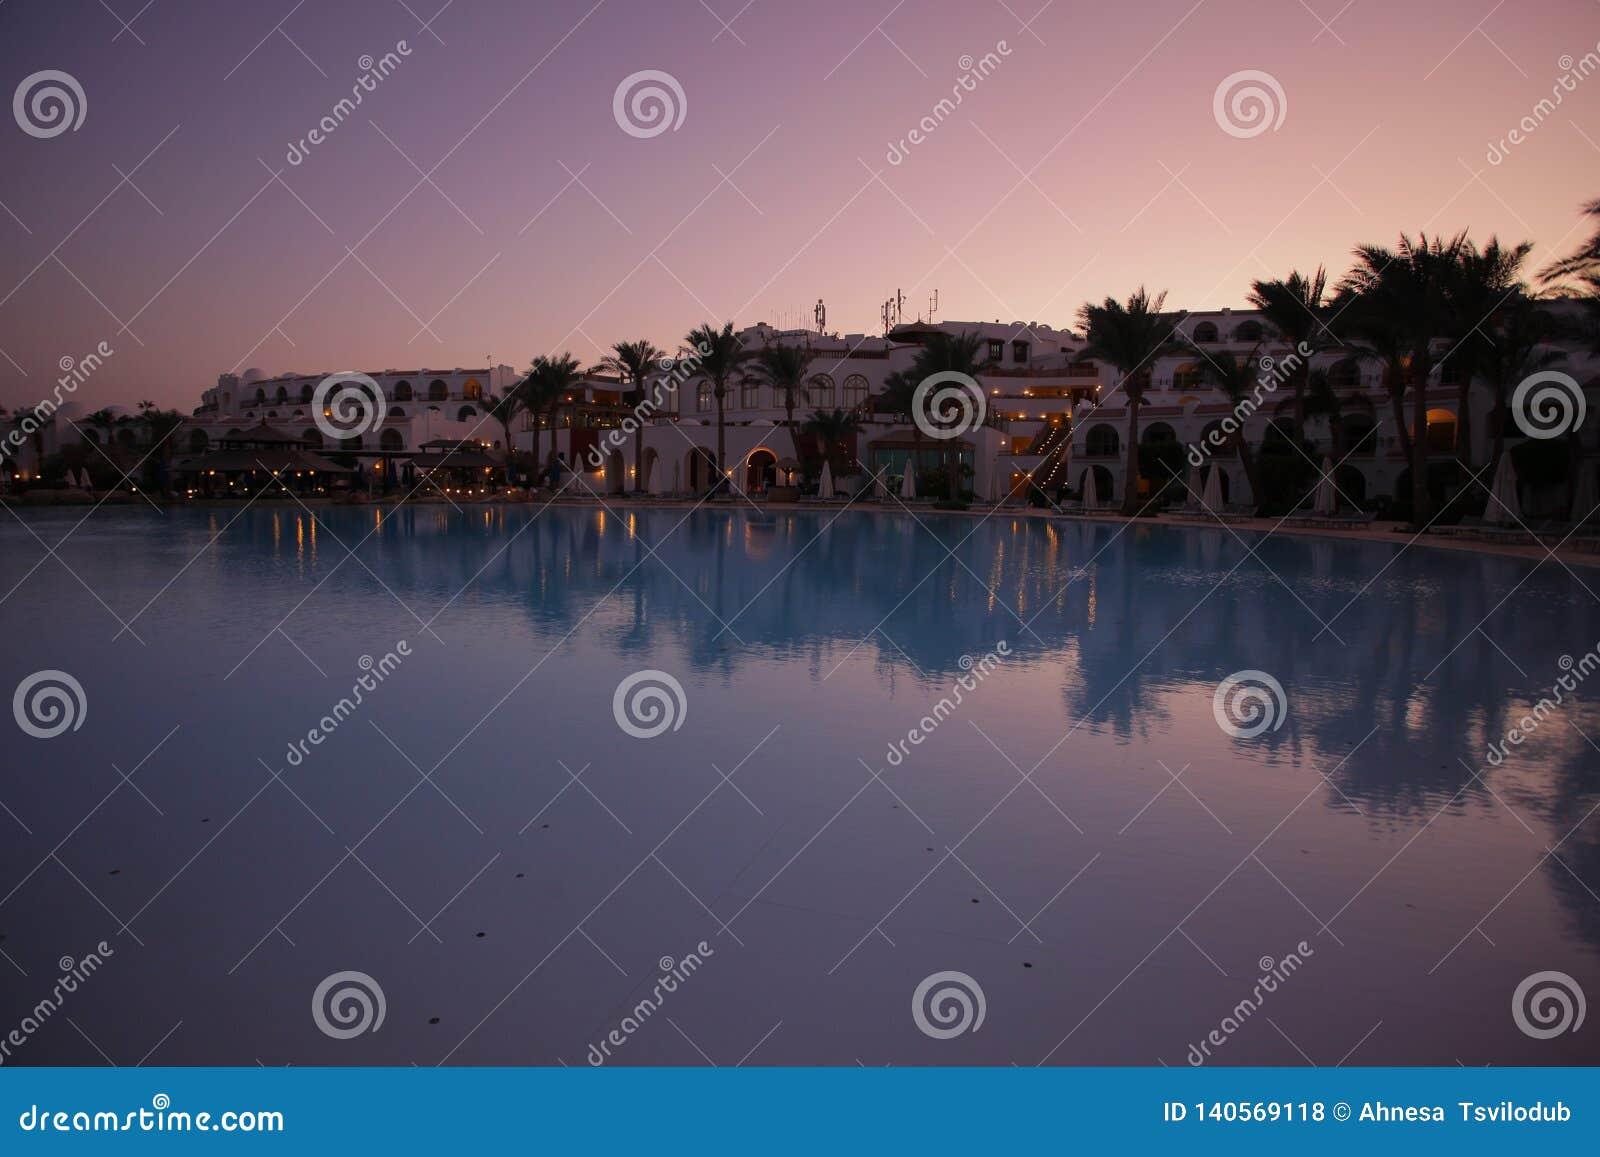 Взгляд на гостинице около бассейна